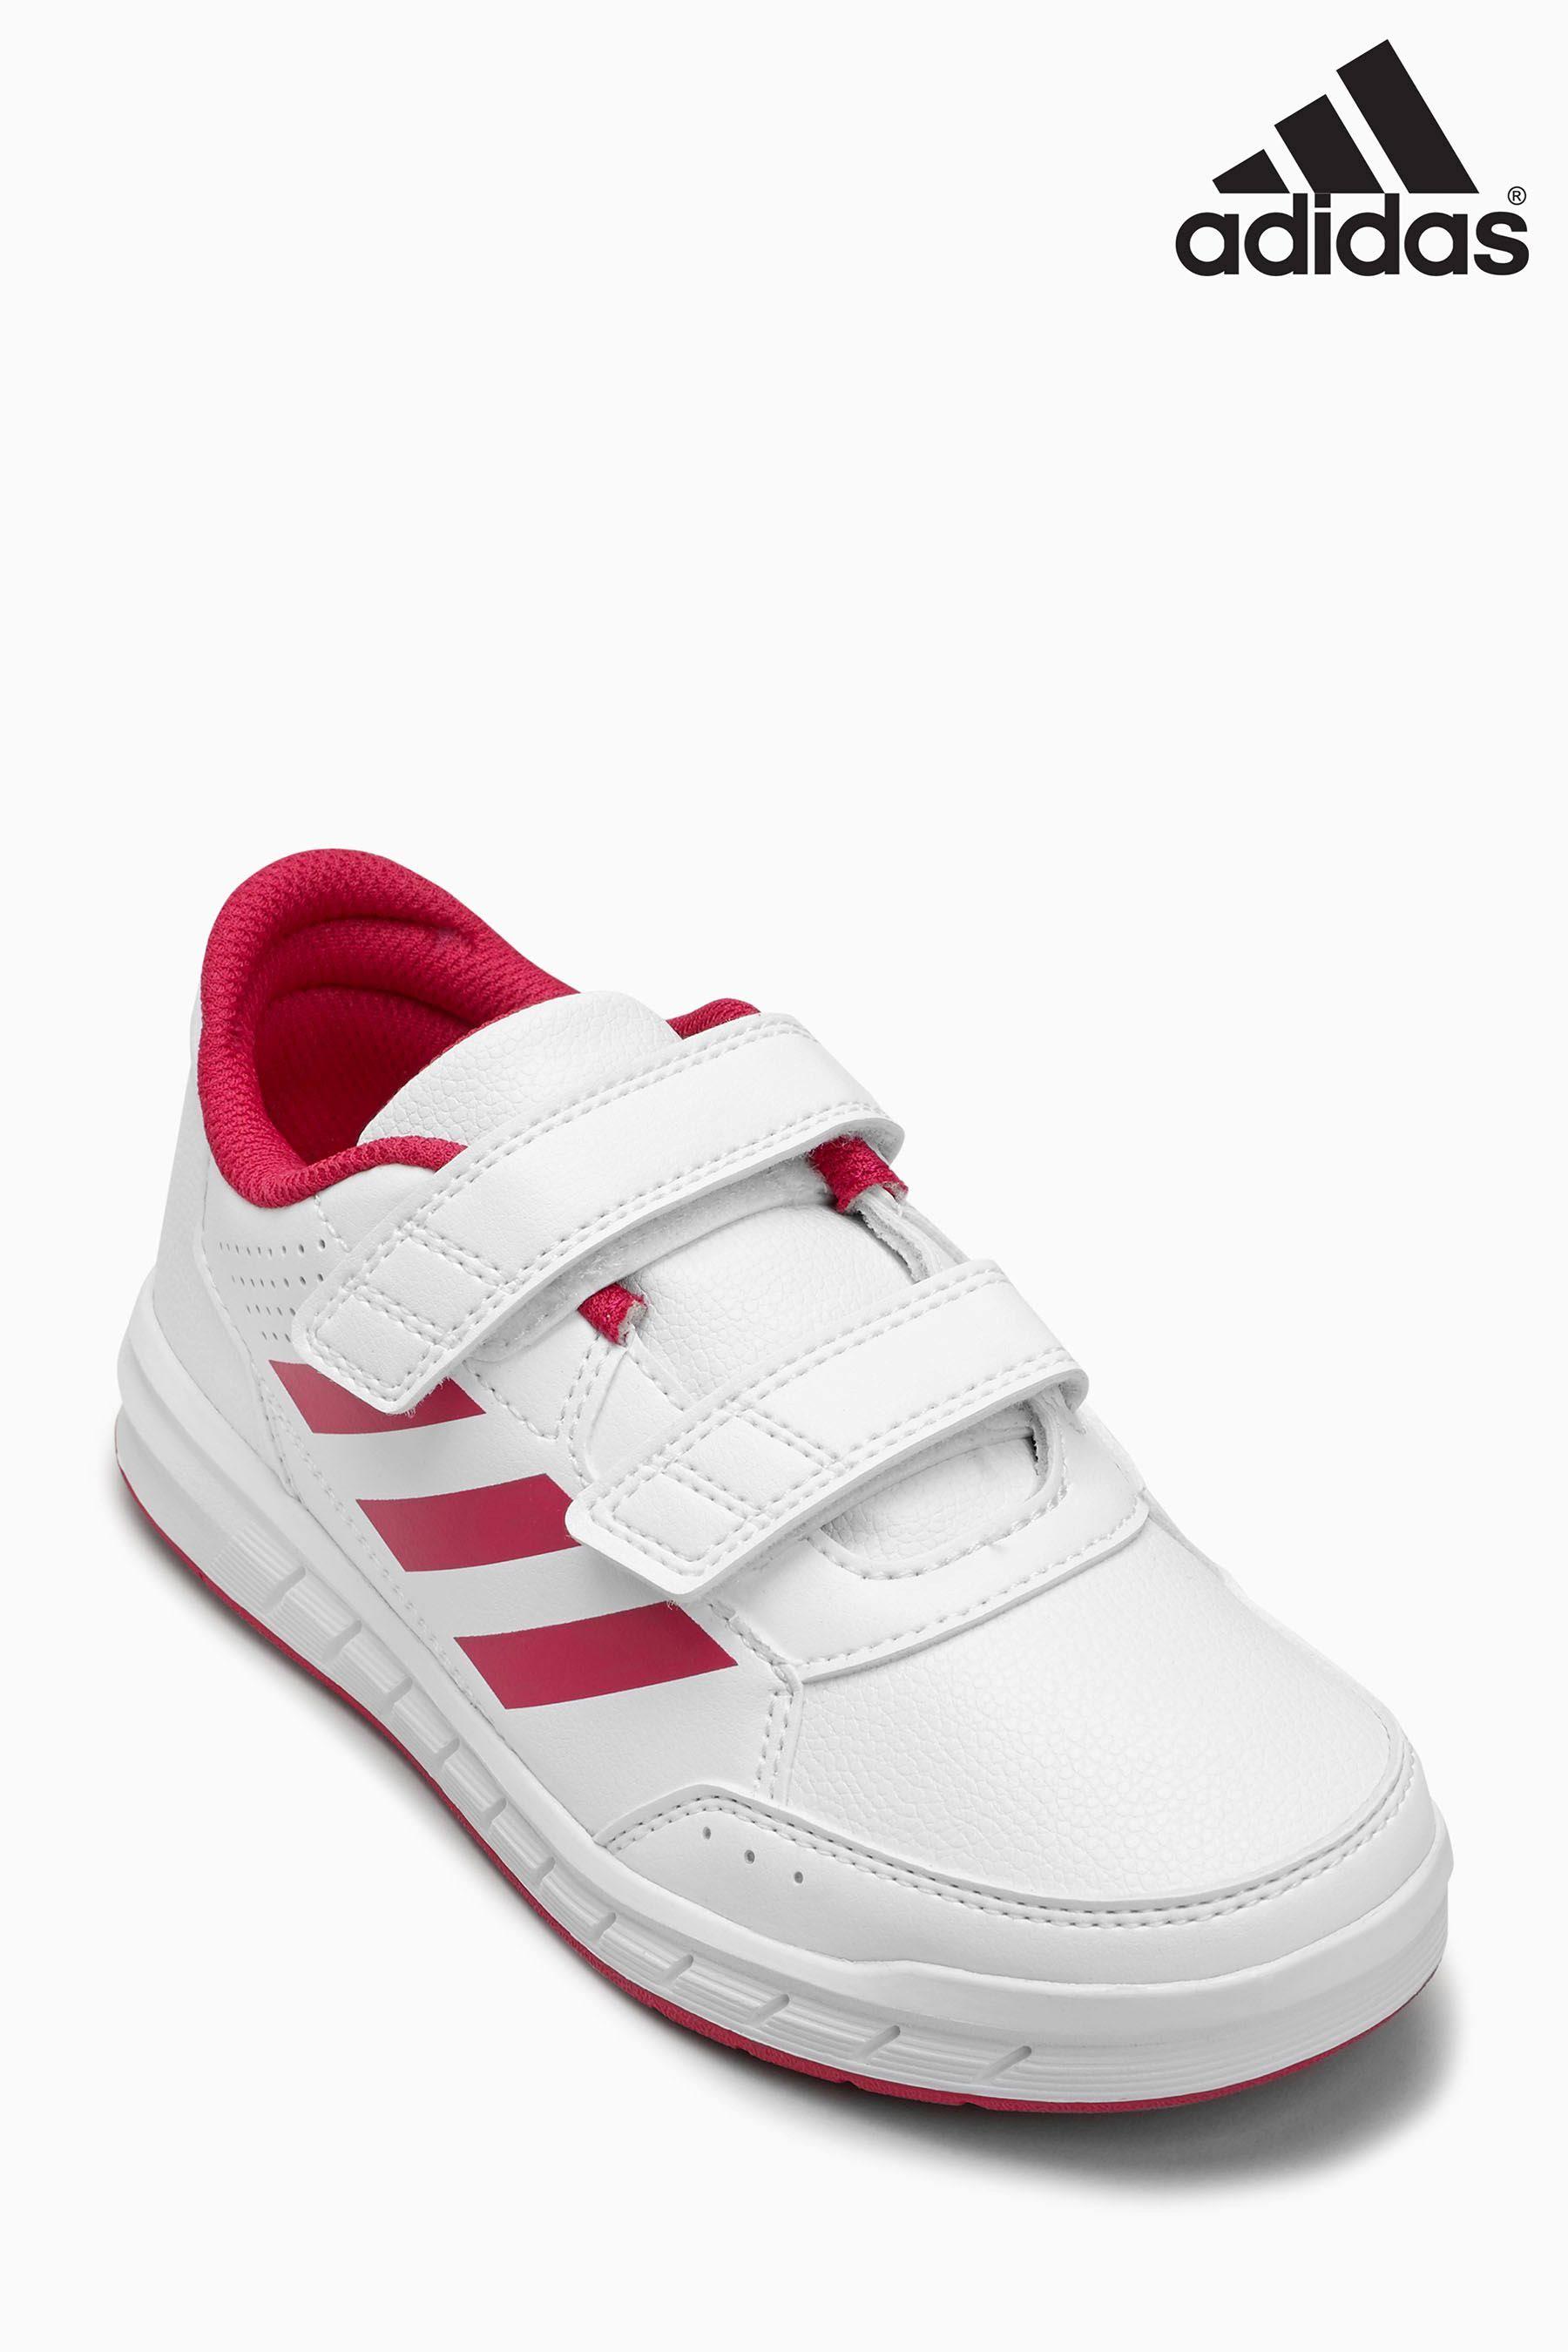 I Boldpink Adidas 4 Us Ftwrwhite Altasport 5 Cf E0qqpw6